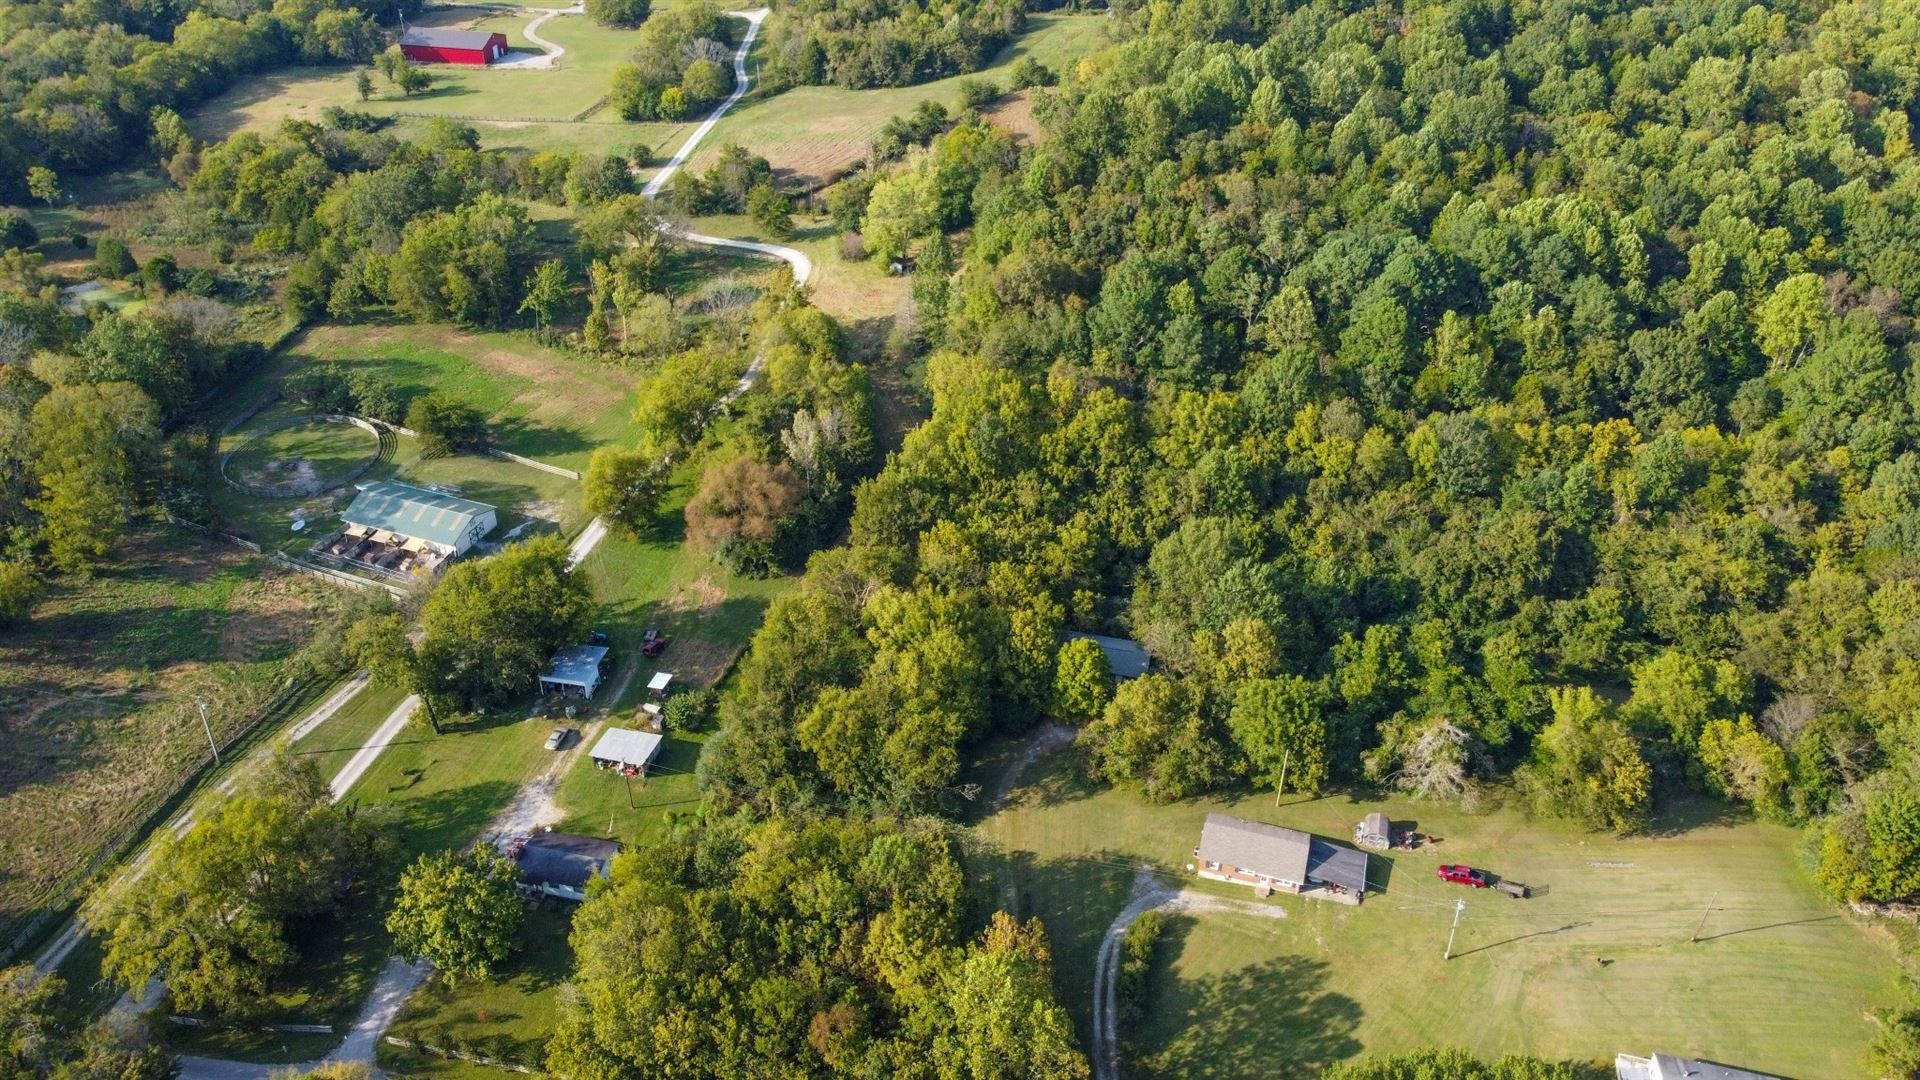 Photo of 2794 Owl Hollow Rd, Franklin, TN 37064 (MLS # 2236508)